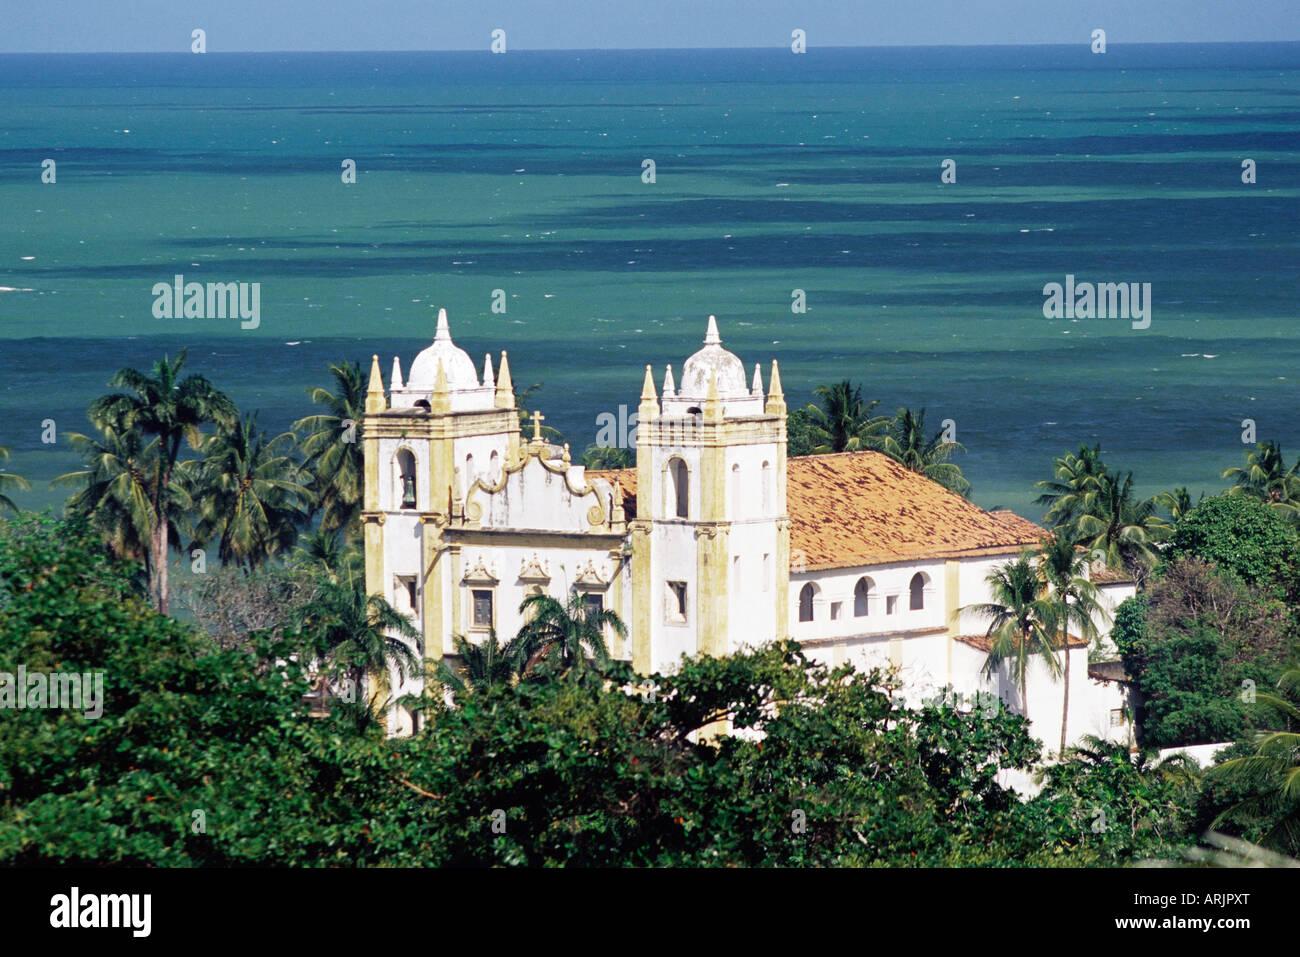 Aerial view of Igrejia NS do Carmo and sea in background, Olinda, Per. Brazil, South America - Stock Image